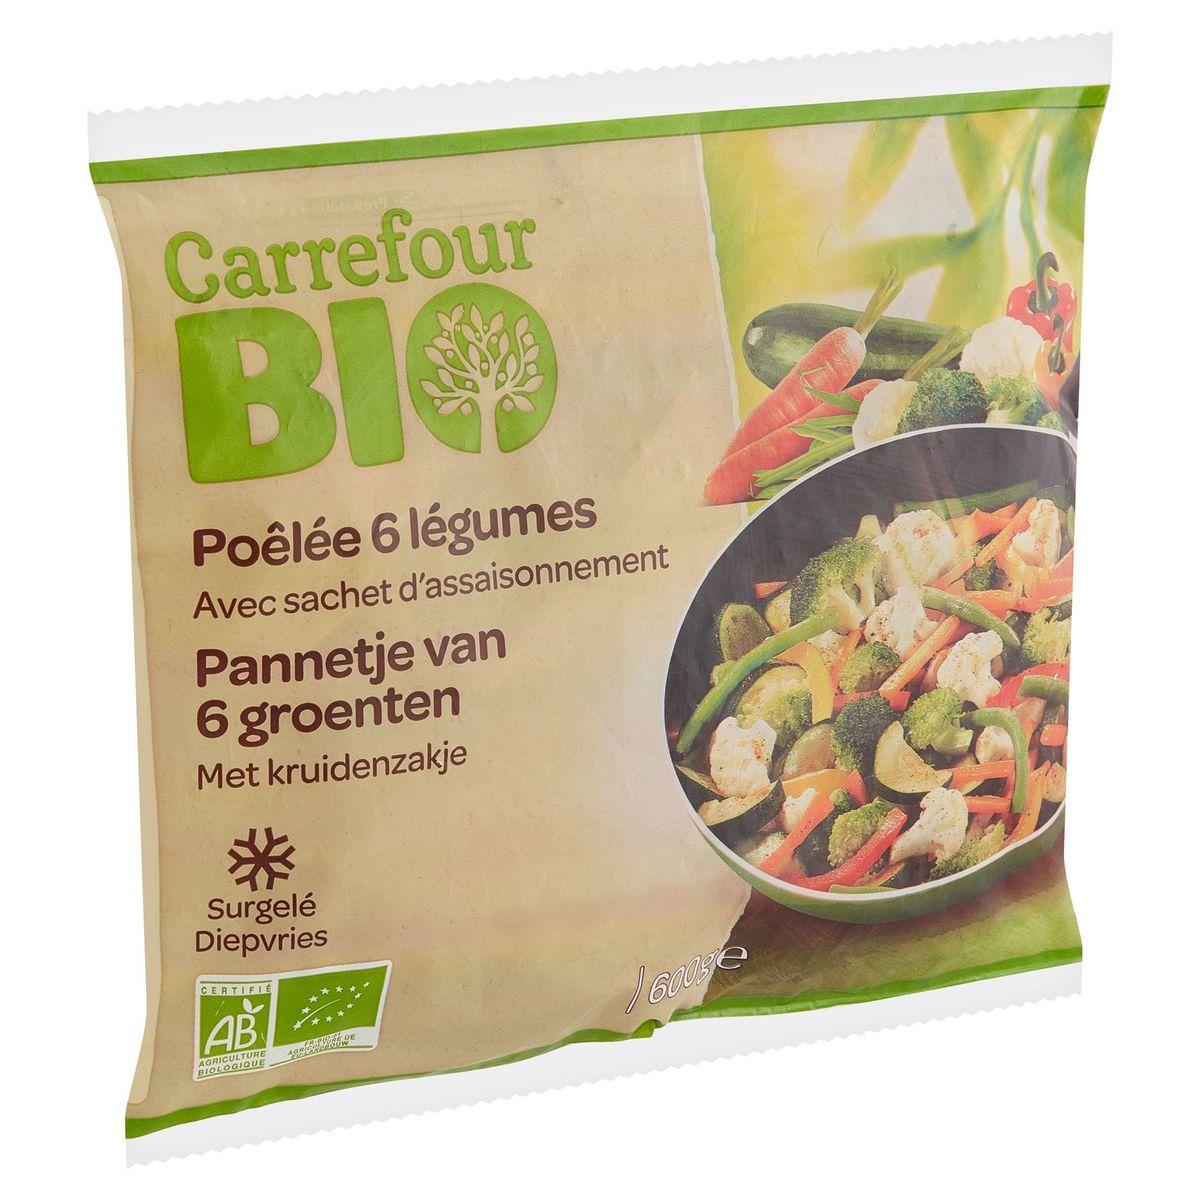 Carrefour Bio Pannetje van 6 Groenten met Kruidenzakje 600 g